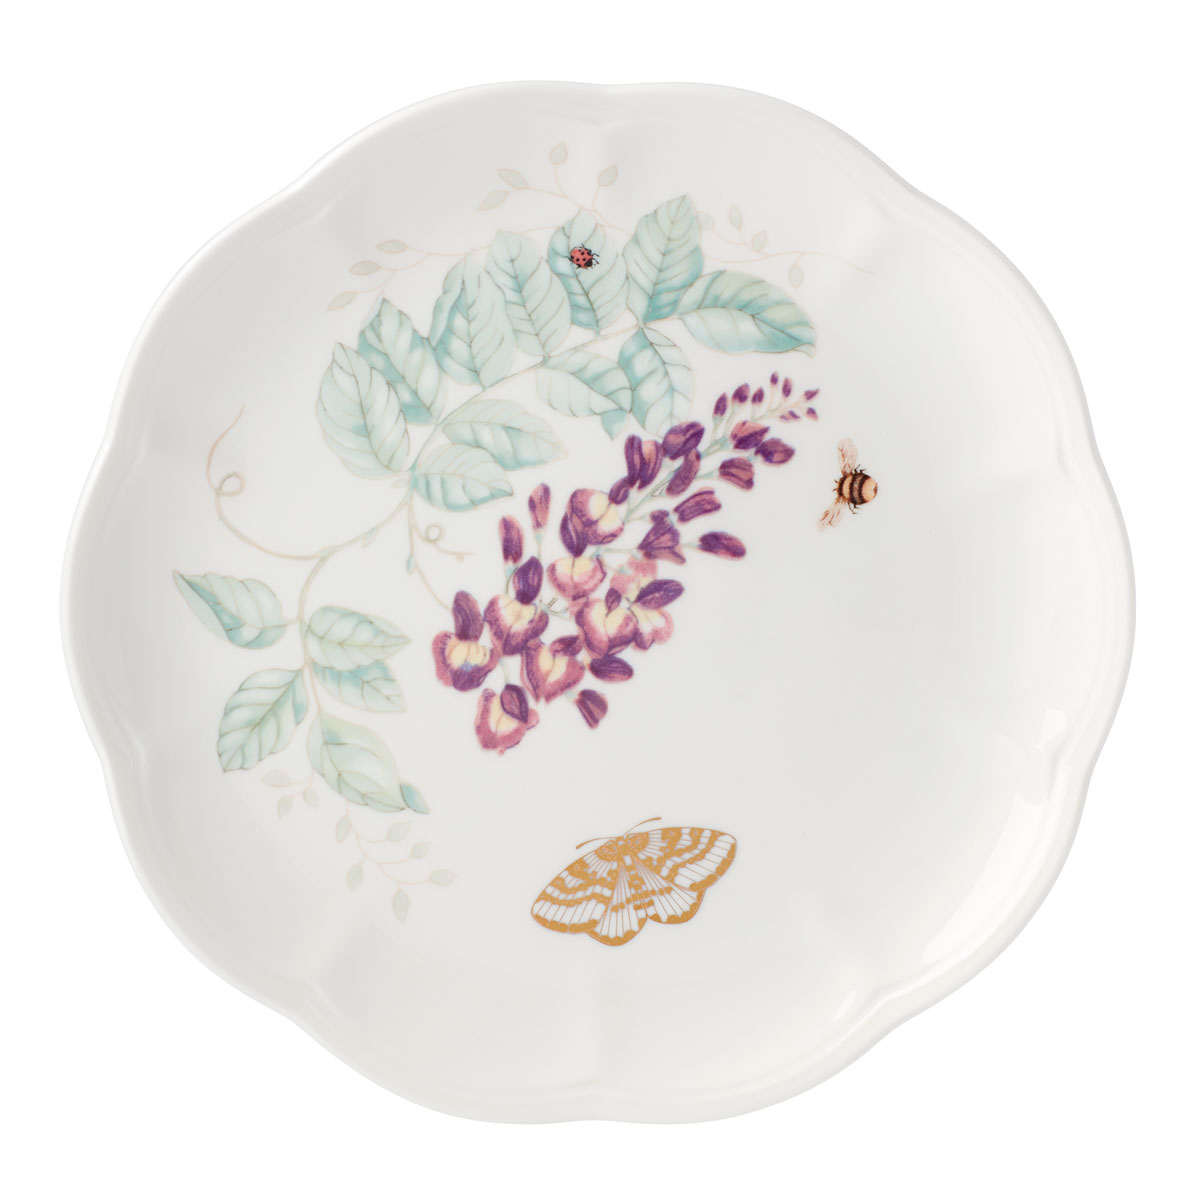 Lenox Butterly Meadow Gold Dinnerware Blue Butterlfy Accent Plate Gold